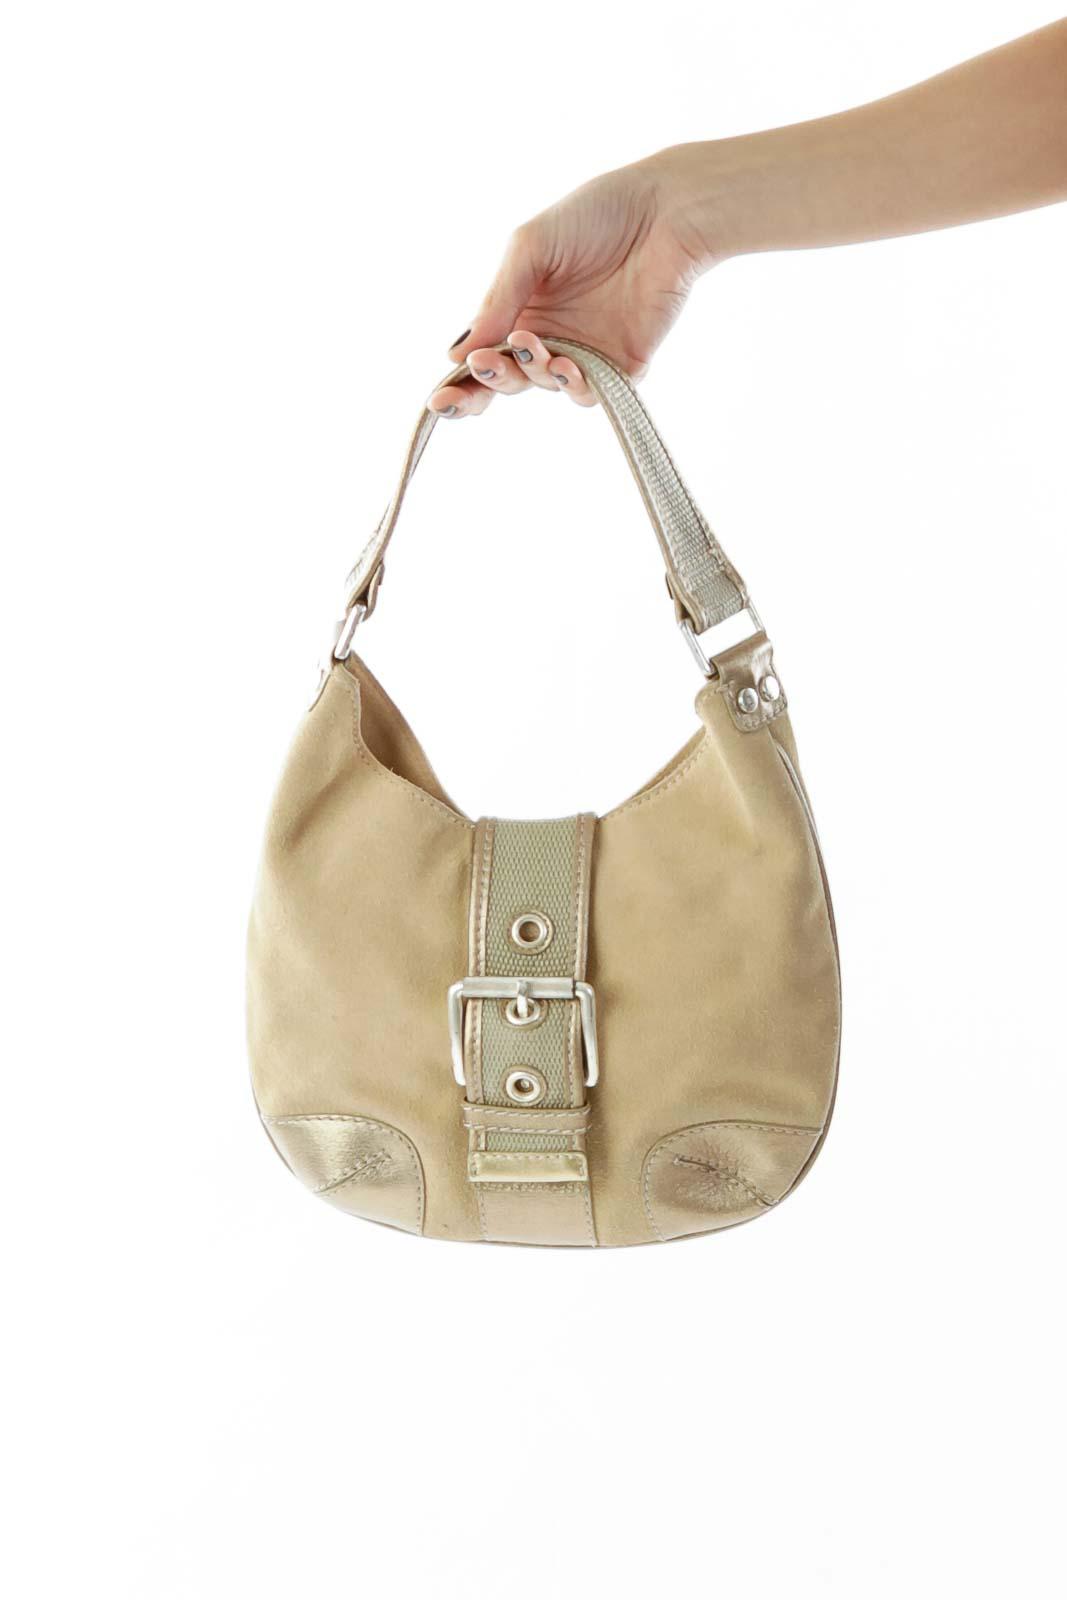 c303295dddf Shop Beige Gold Shoulder Bag w/ Buckle clothing and handbags at ...